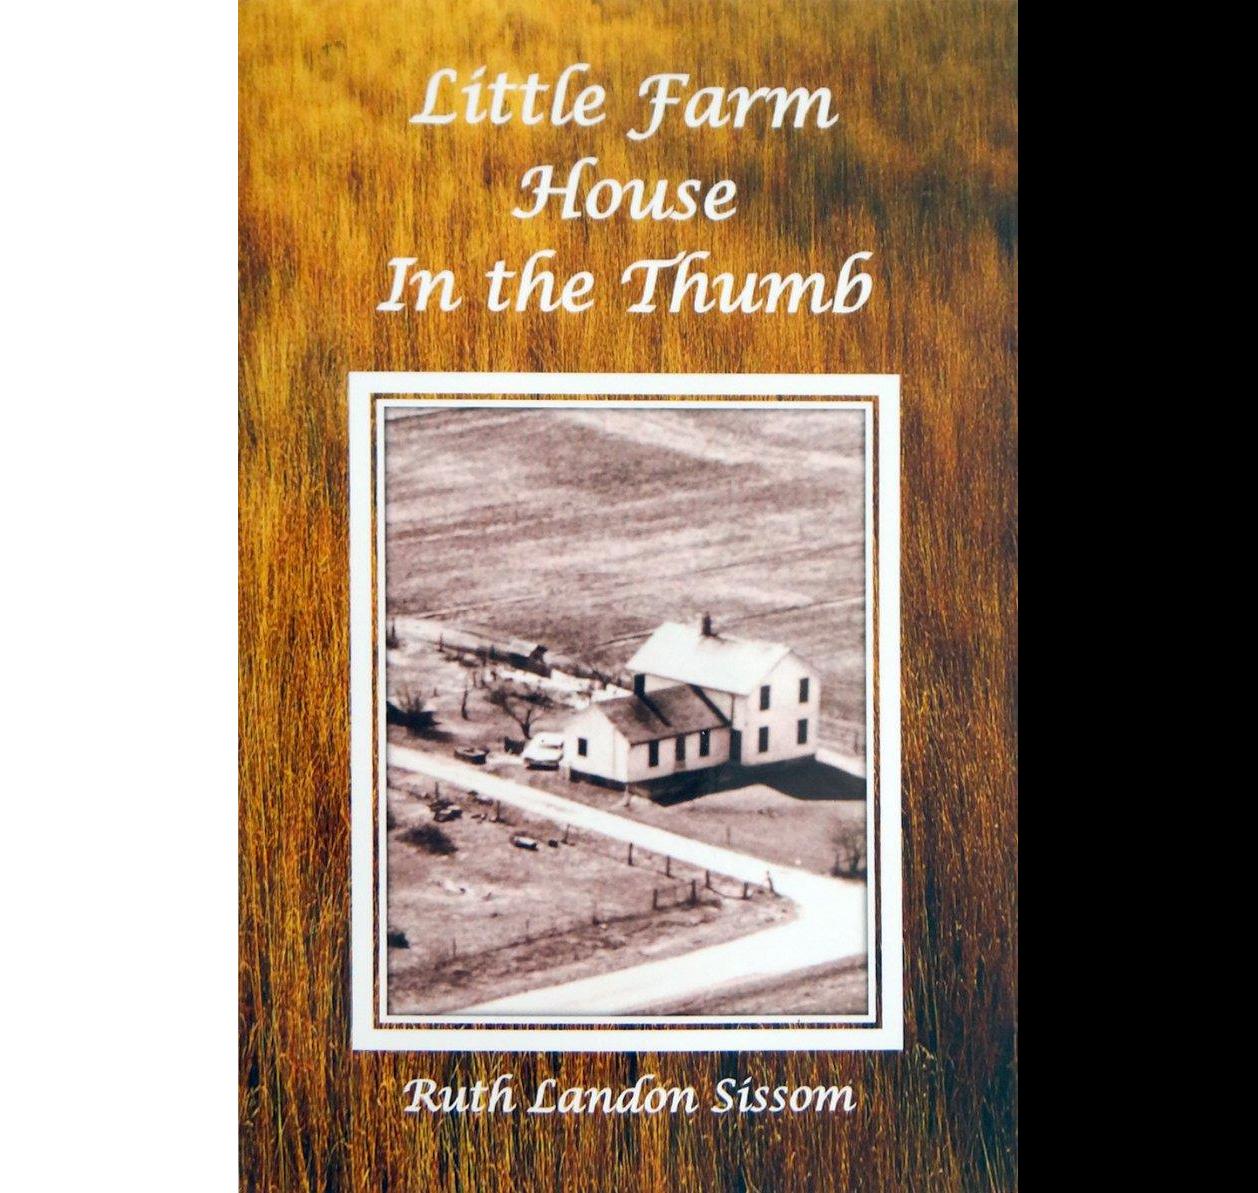 LITTLE FARM HOUSE IN THE THUMB